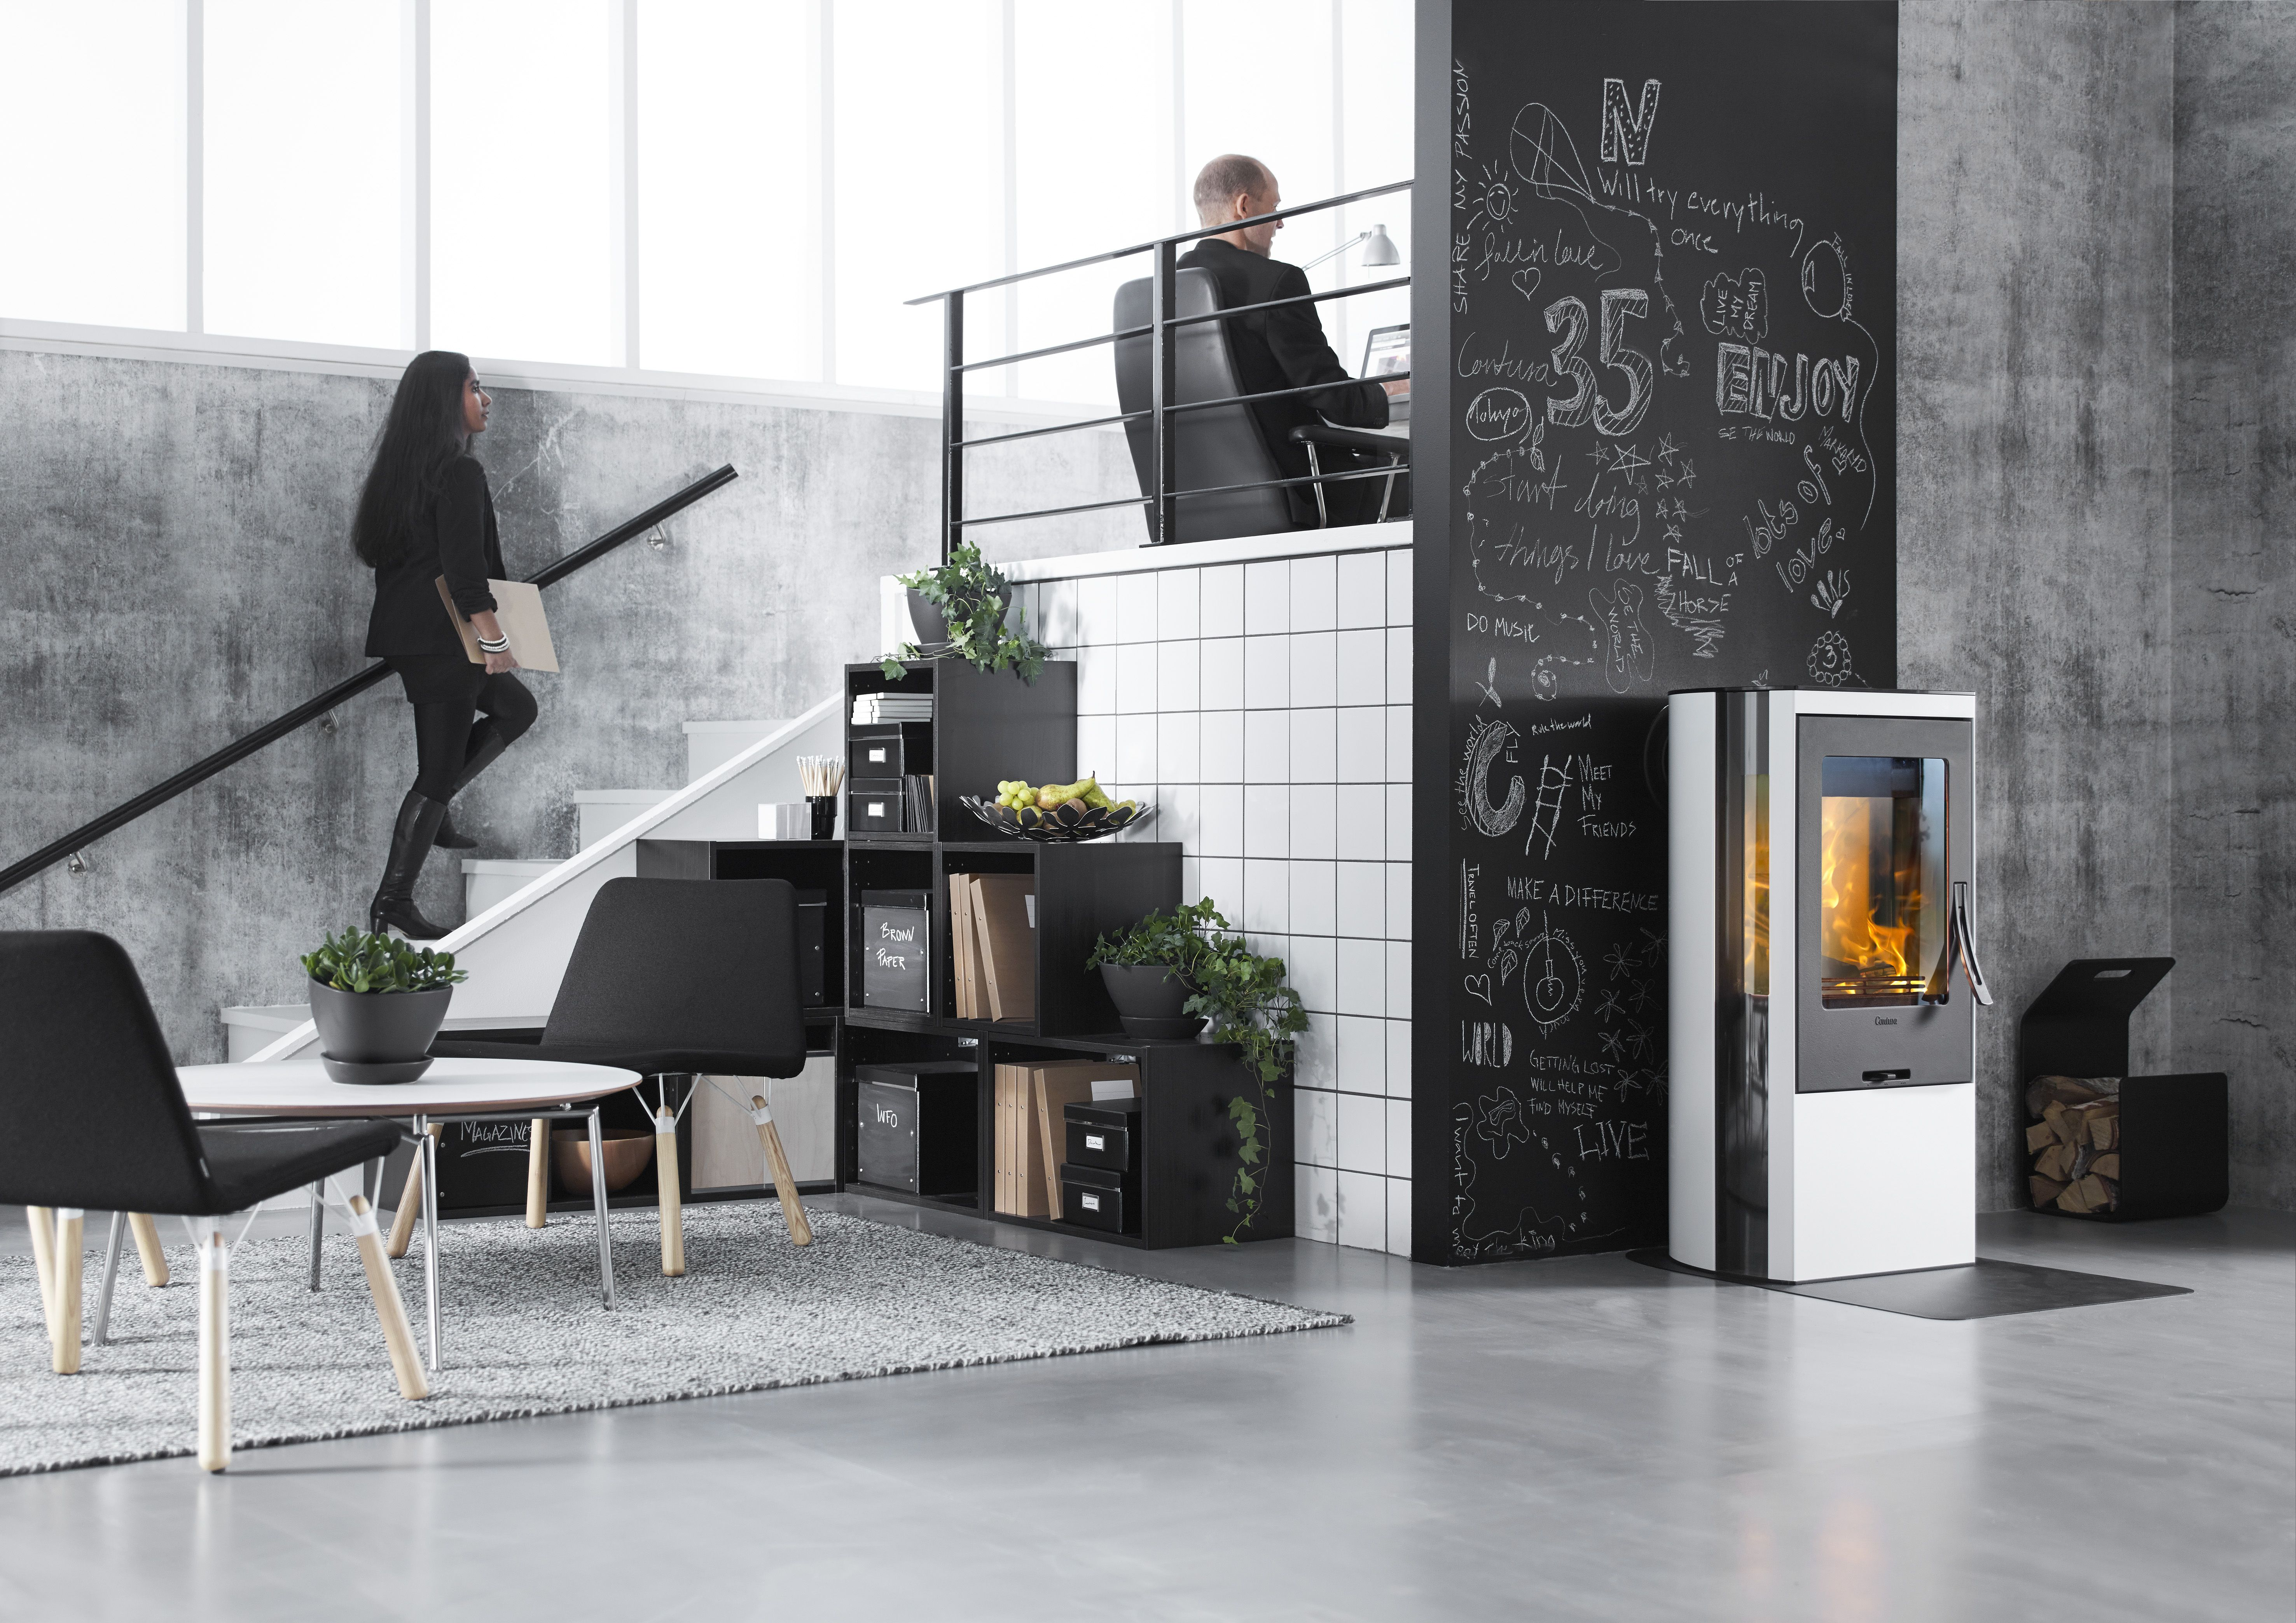 Peisovn Contura 35 lav  #woodstove #fireplace #ildsted #peisovn